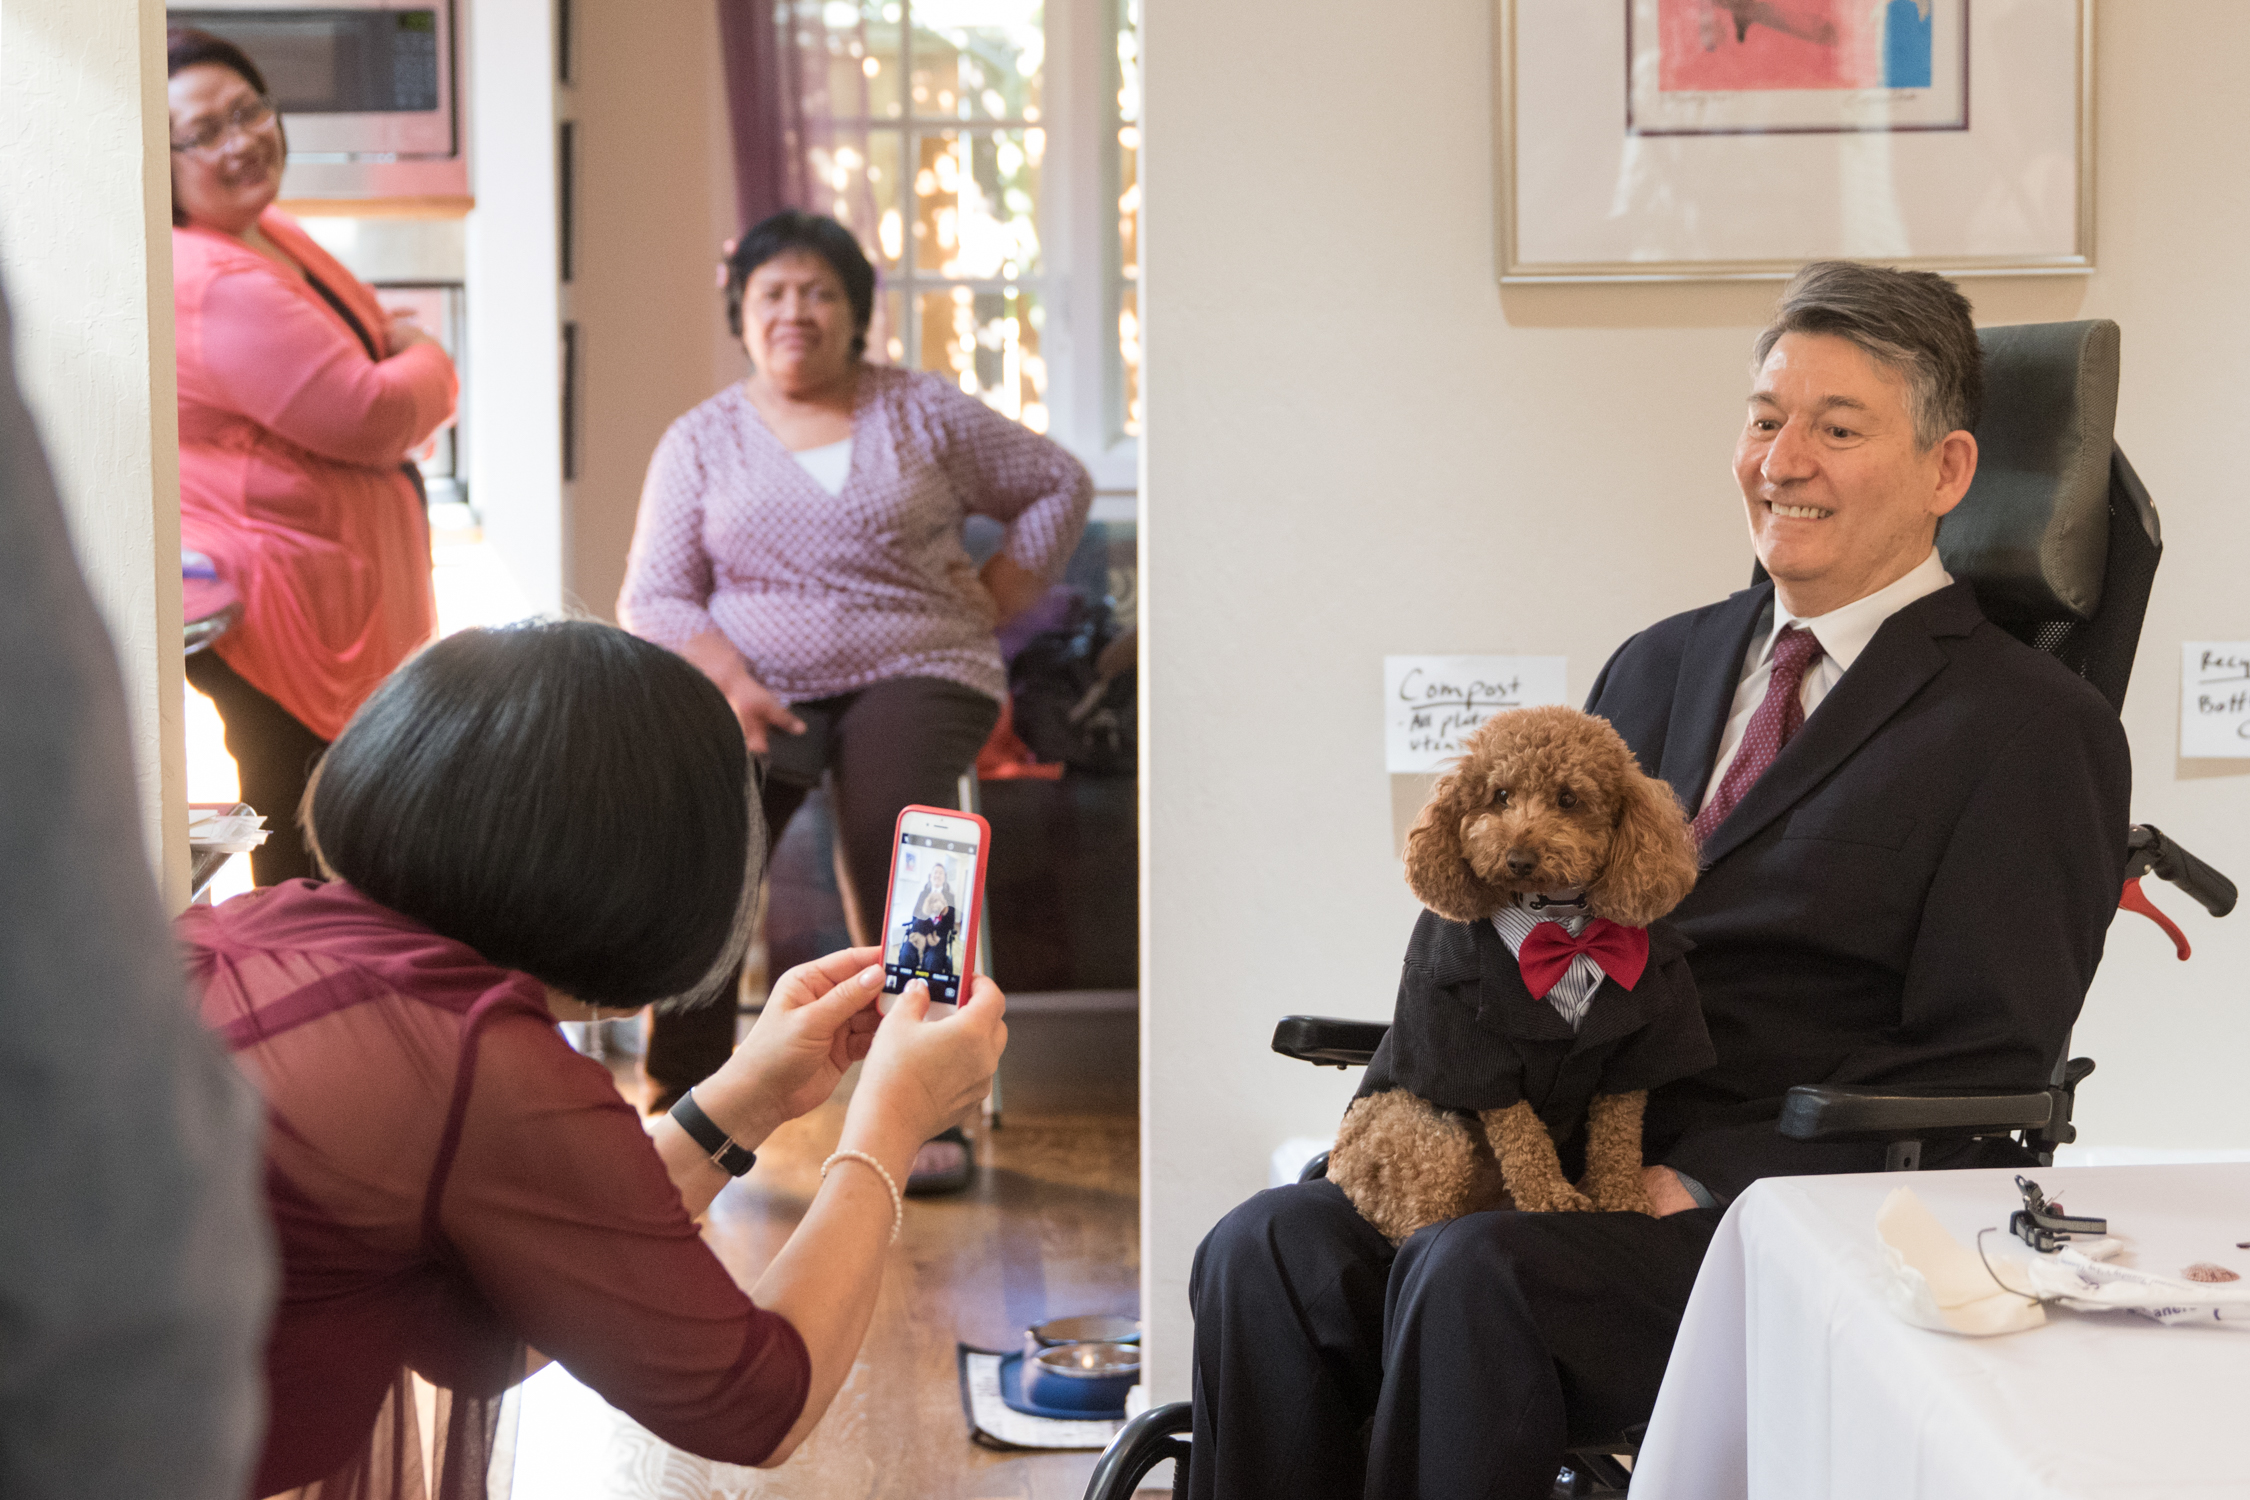 Karen Kang takes a photo of Jon Ferraiolo with their dog, Pepe at their home on April 14, 2018.